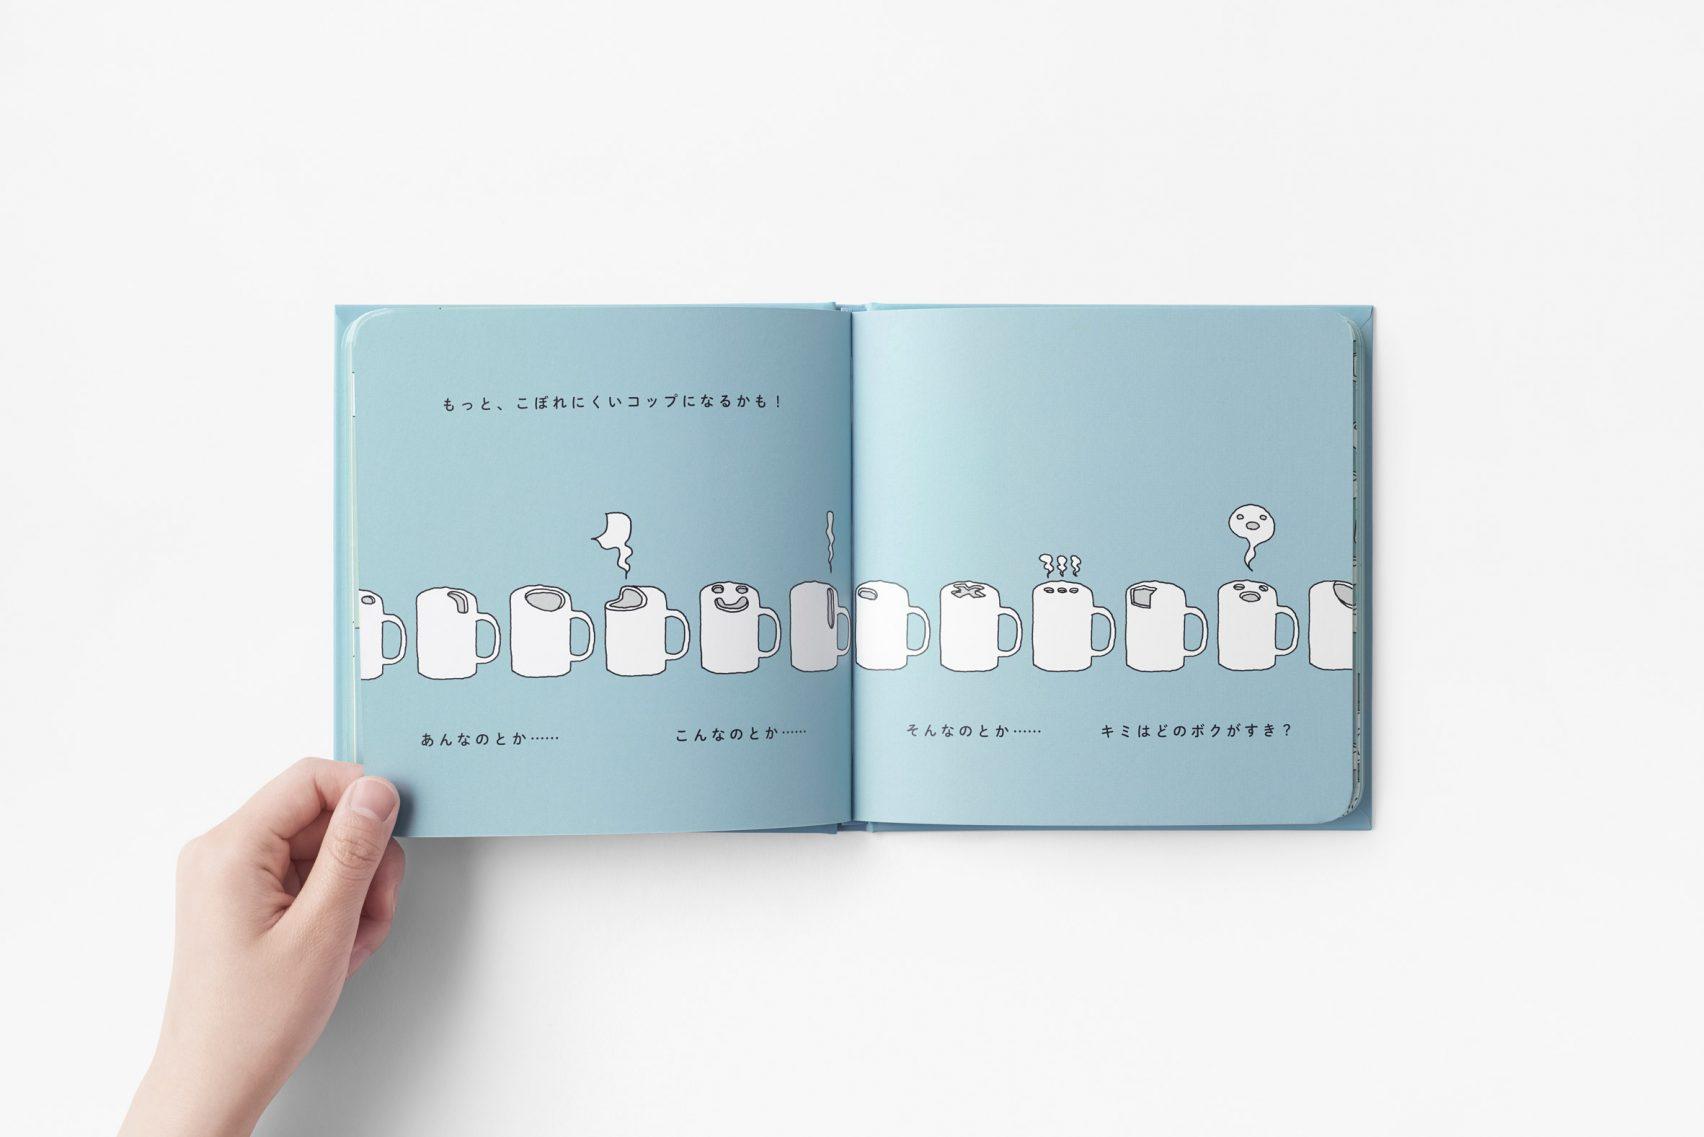 nendo-not-just-a-cup-akihiro-yoshida-2